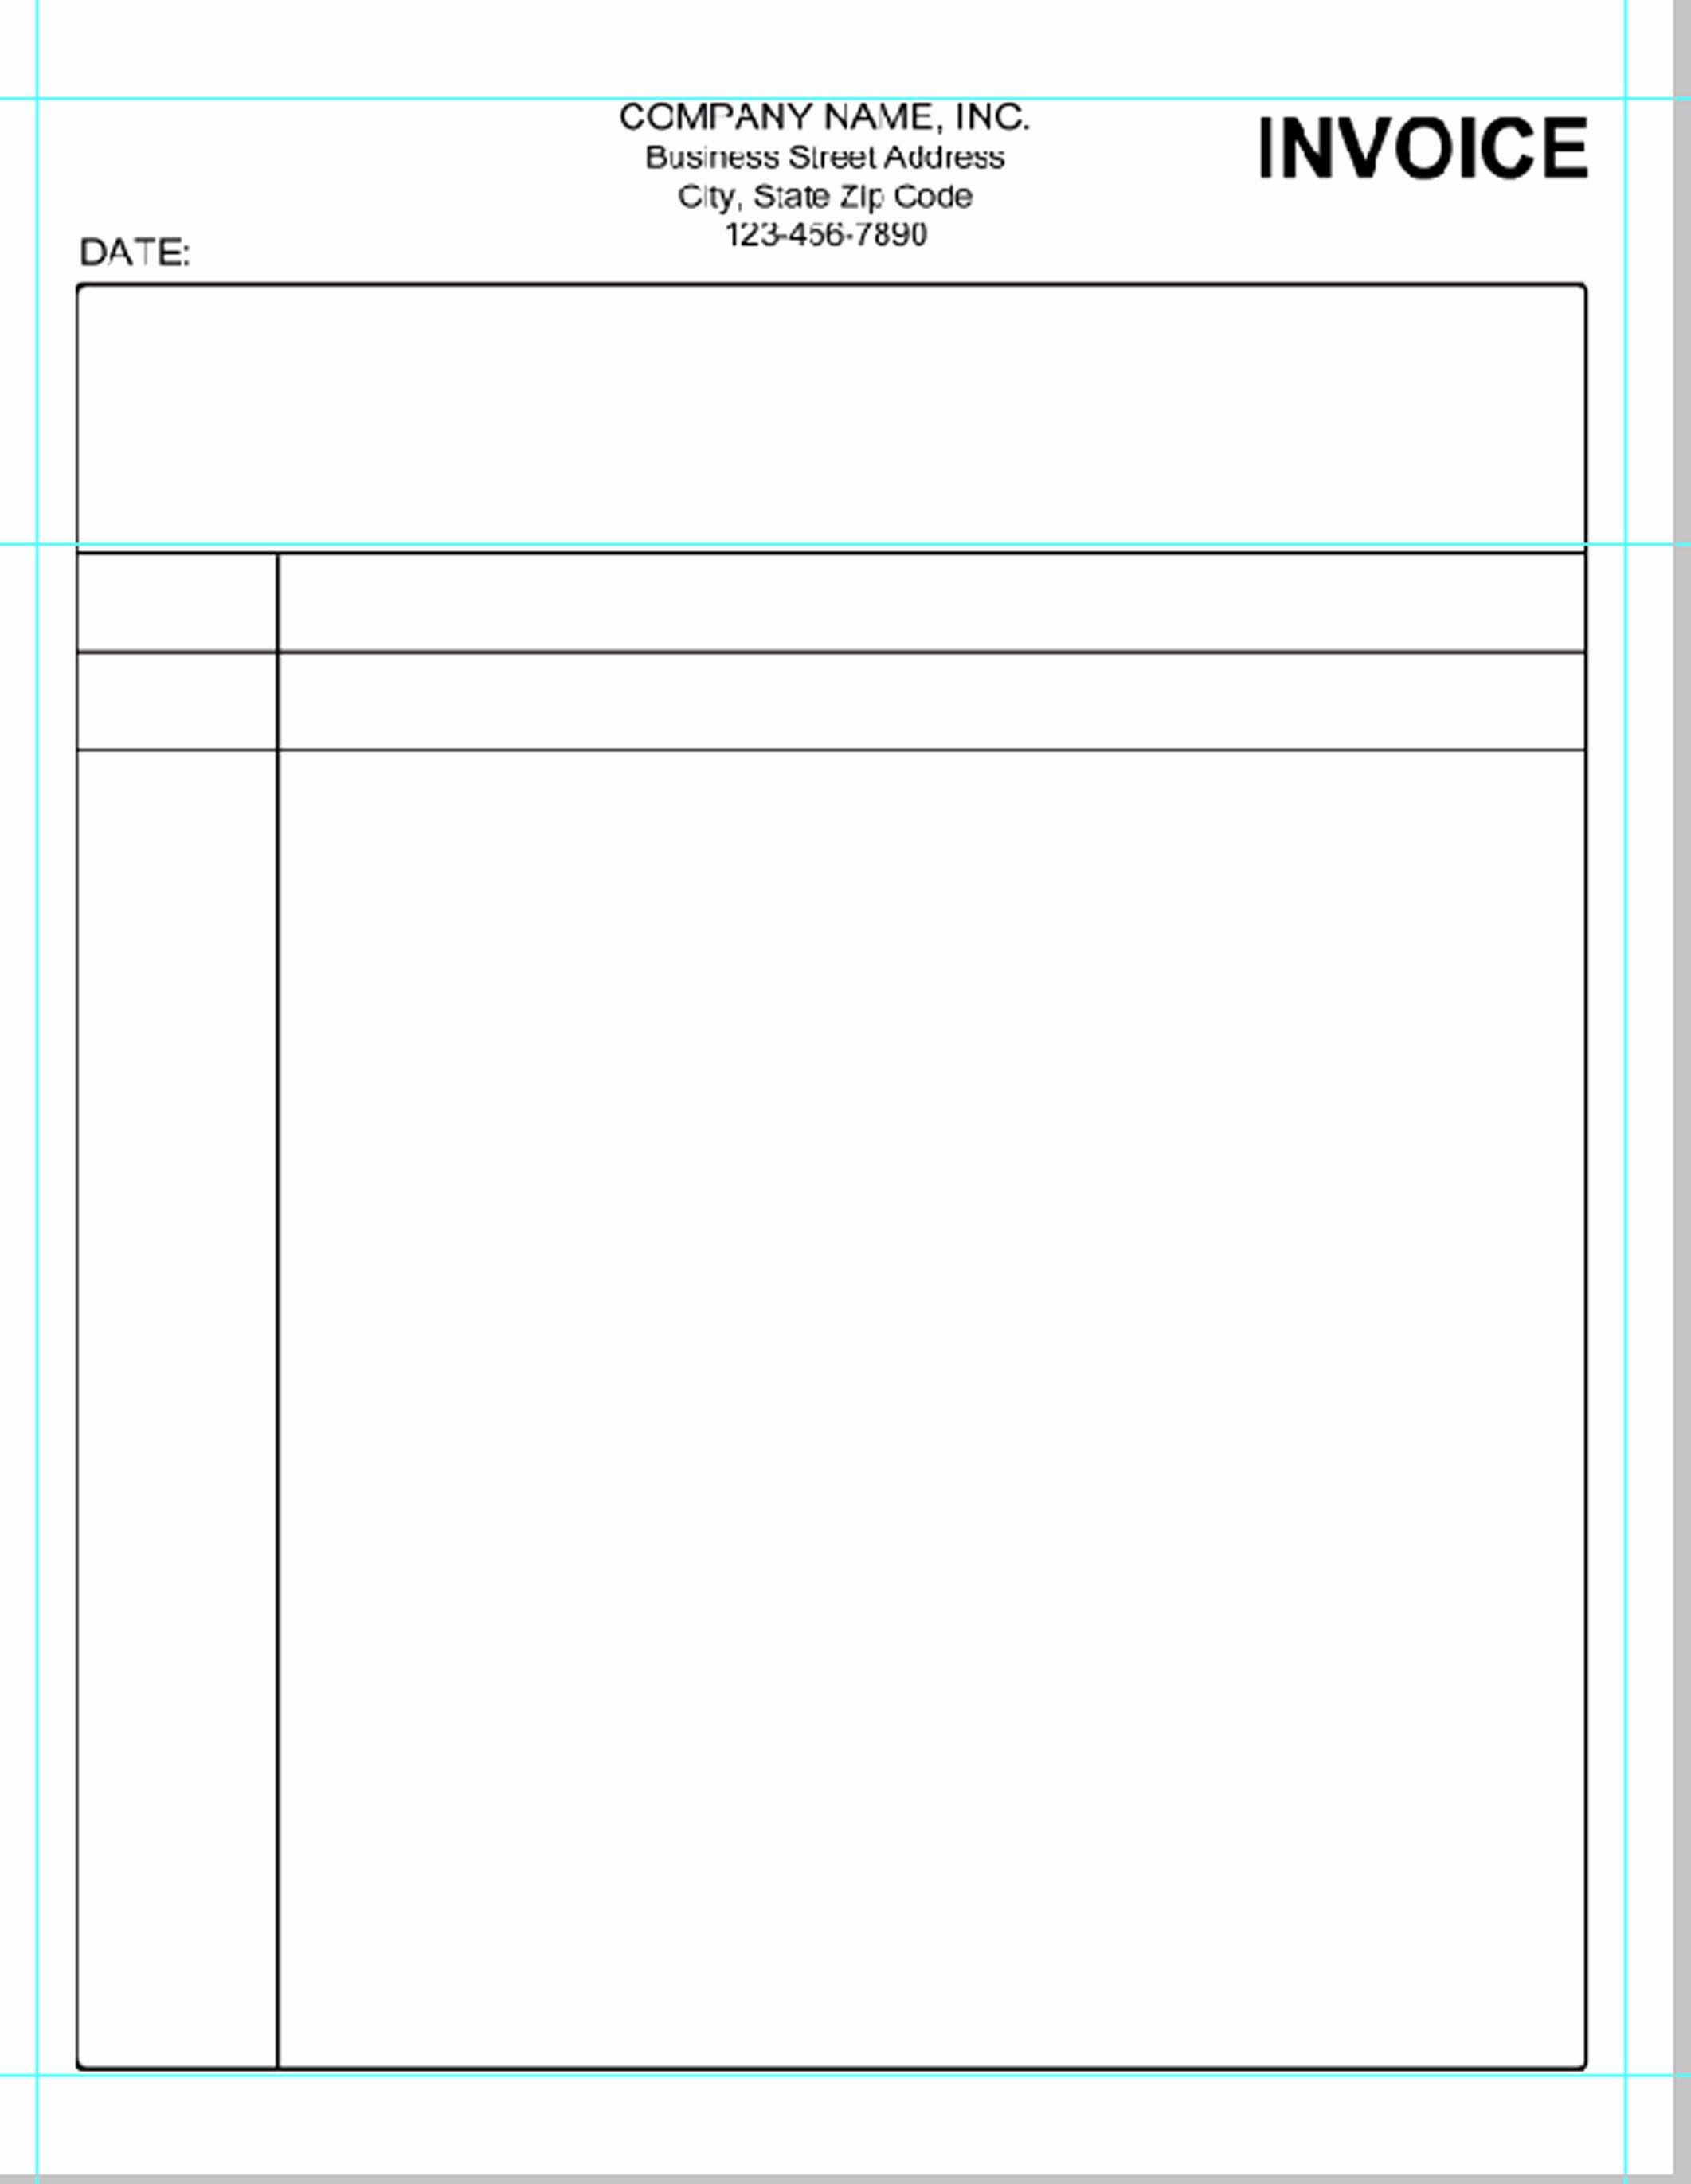 Free Excel Invoice Template Unique Simple Invoice Template Pdf